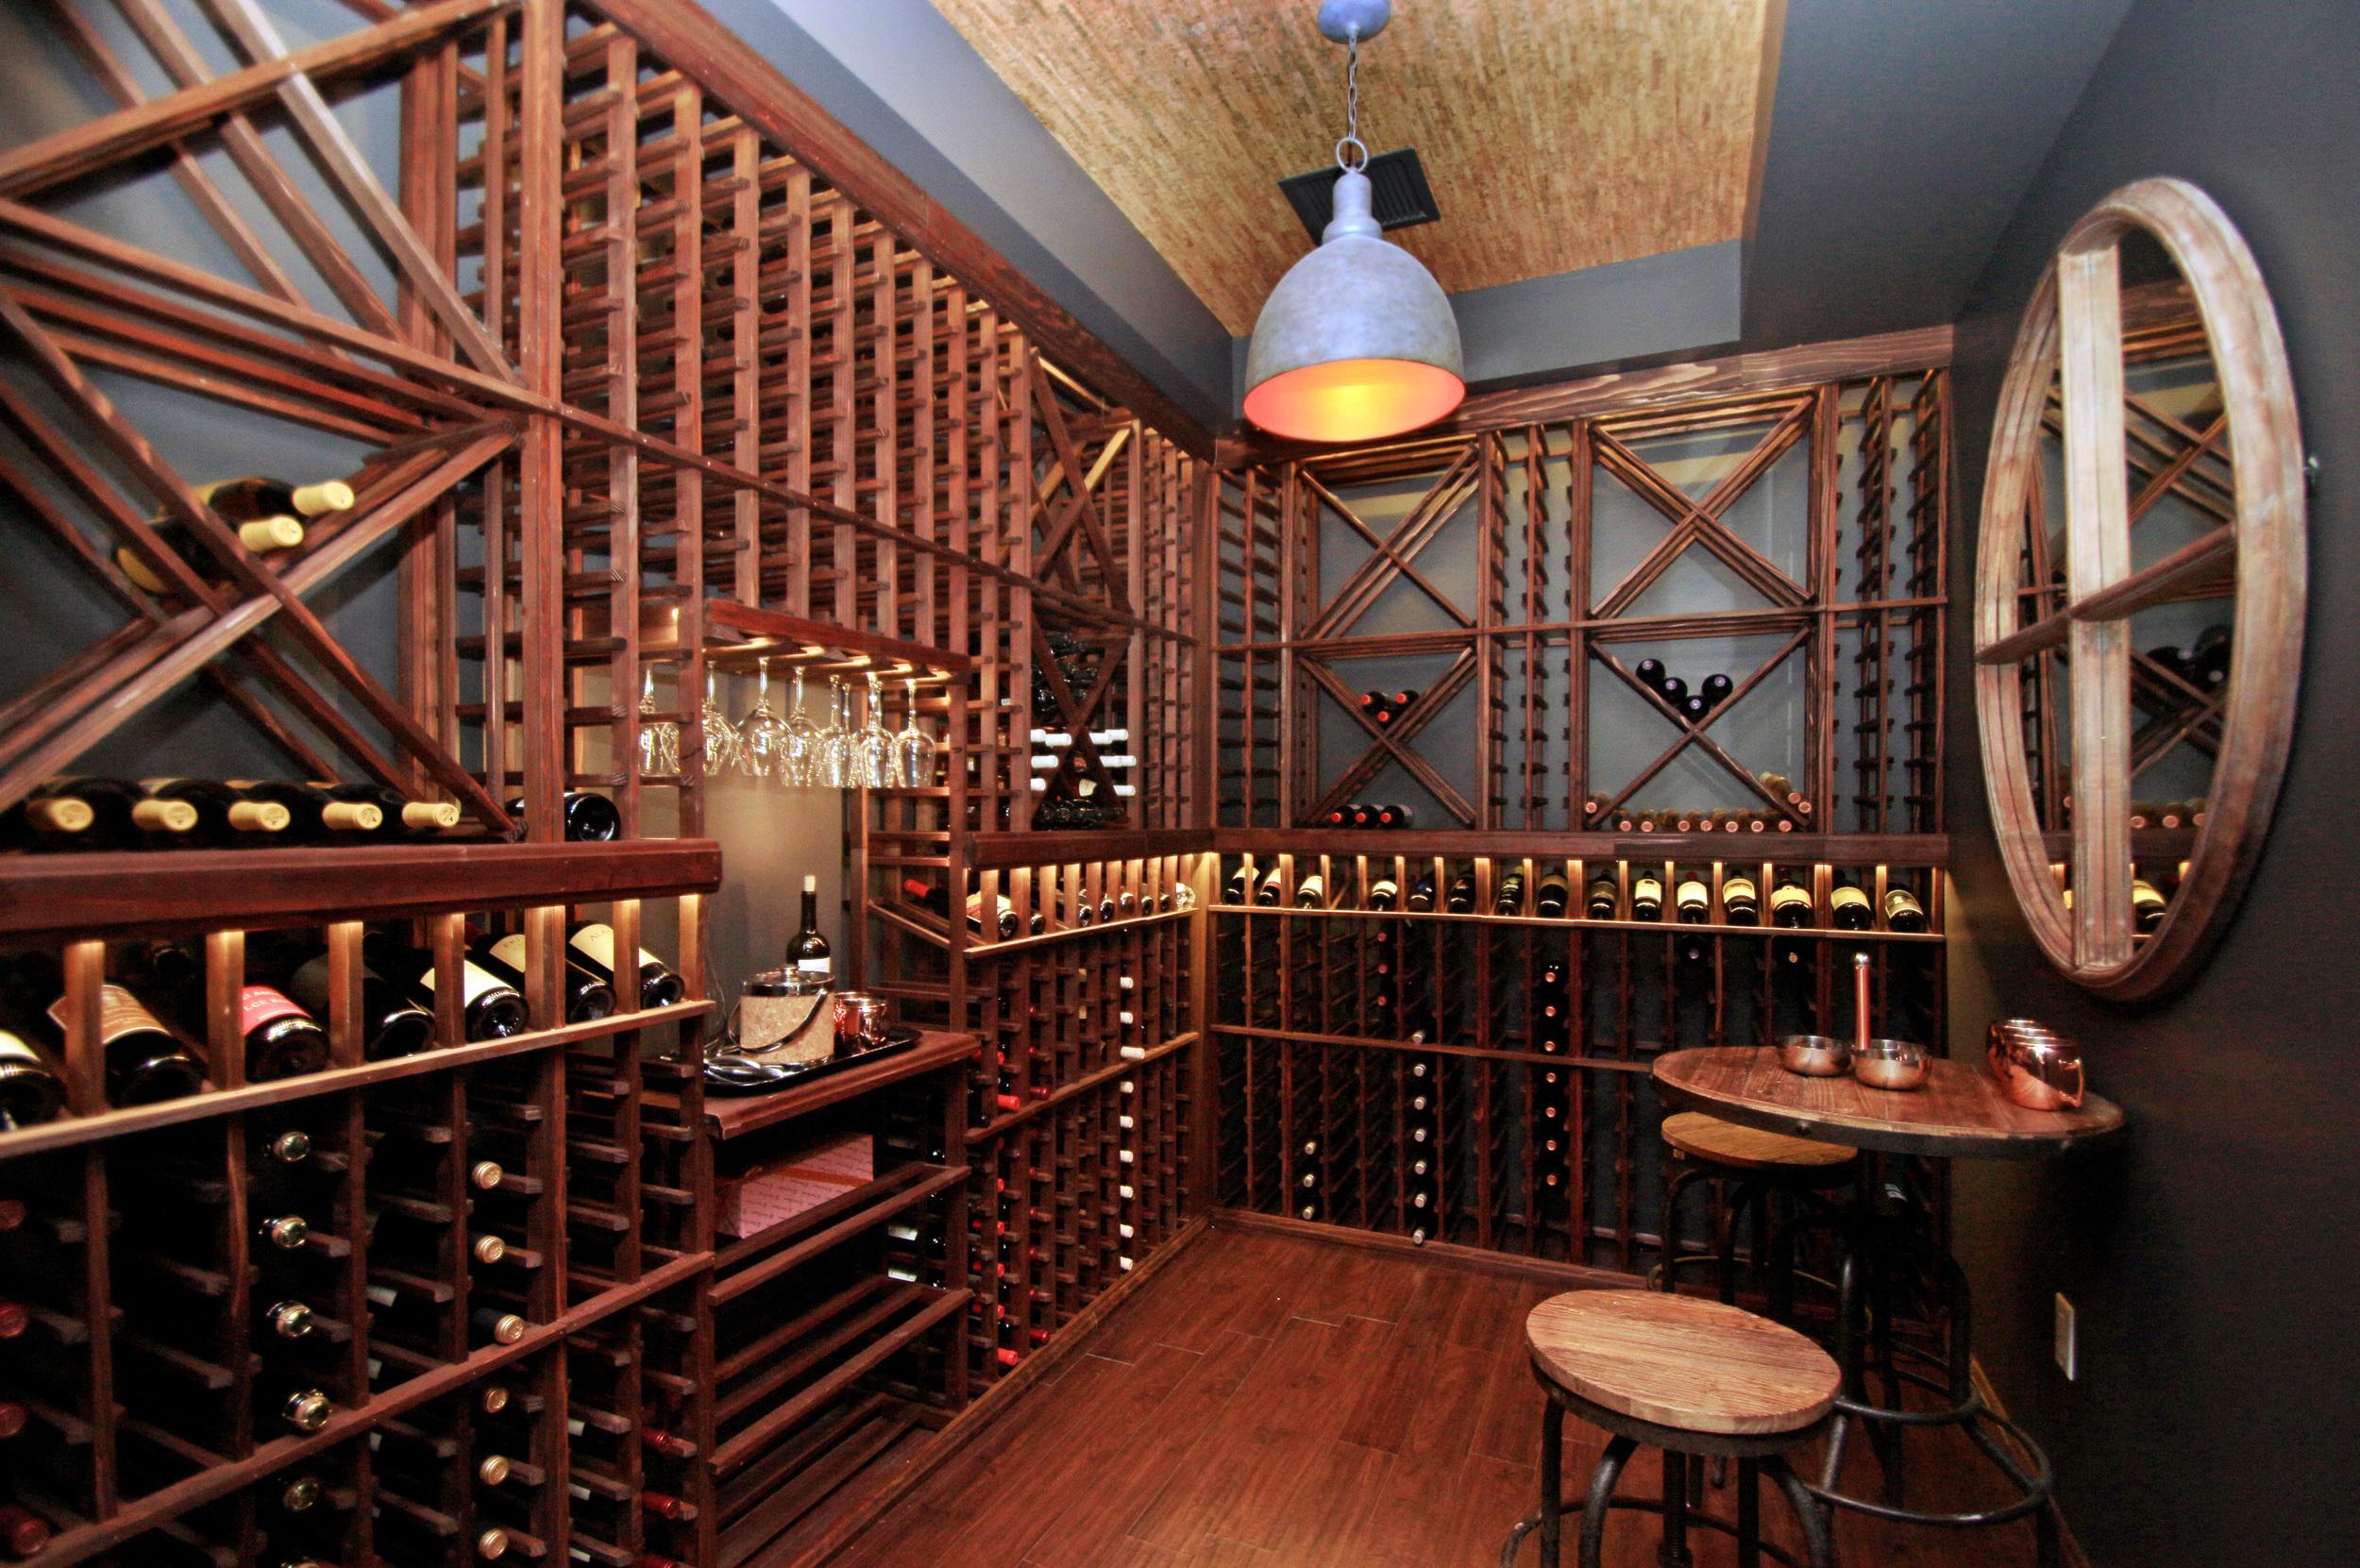 Woodcock wine cellar.jpg